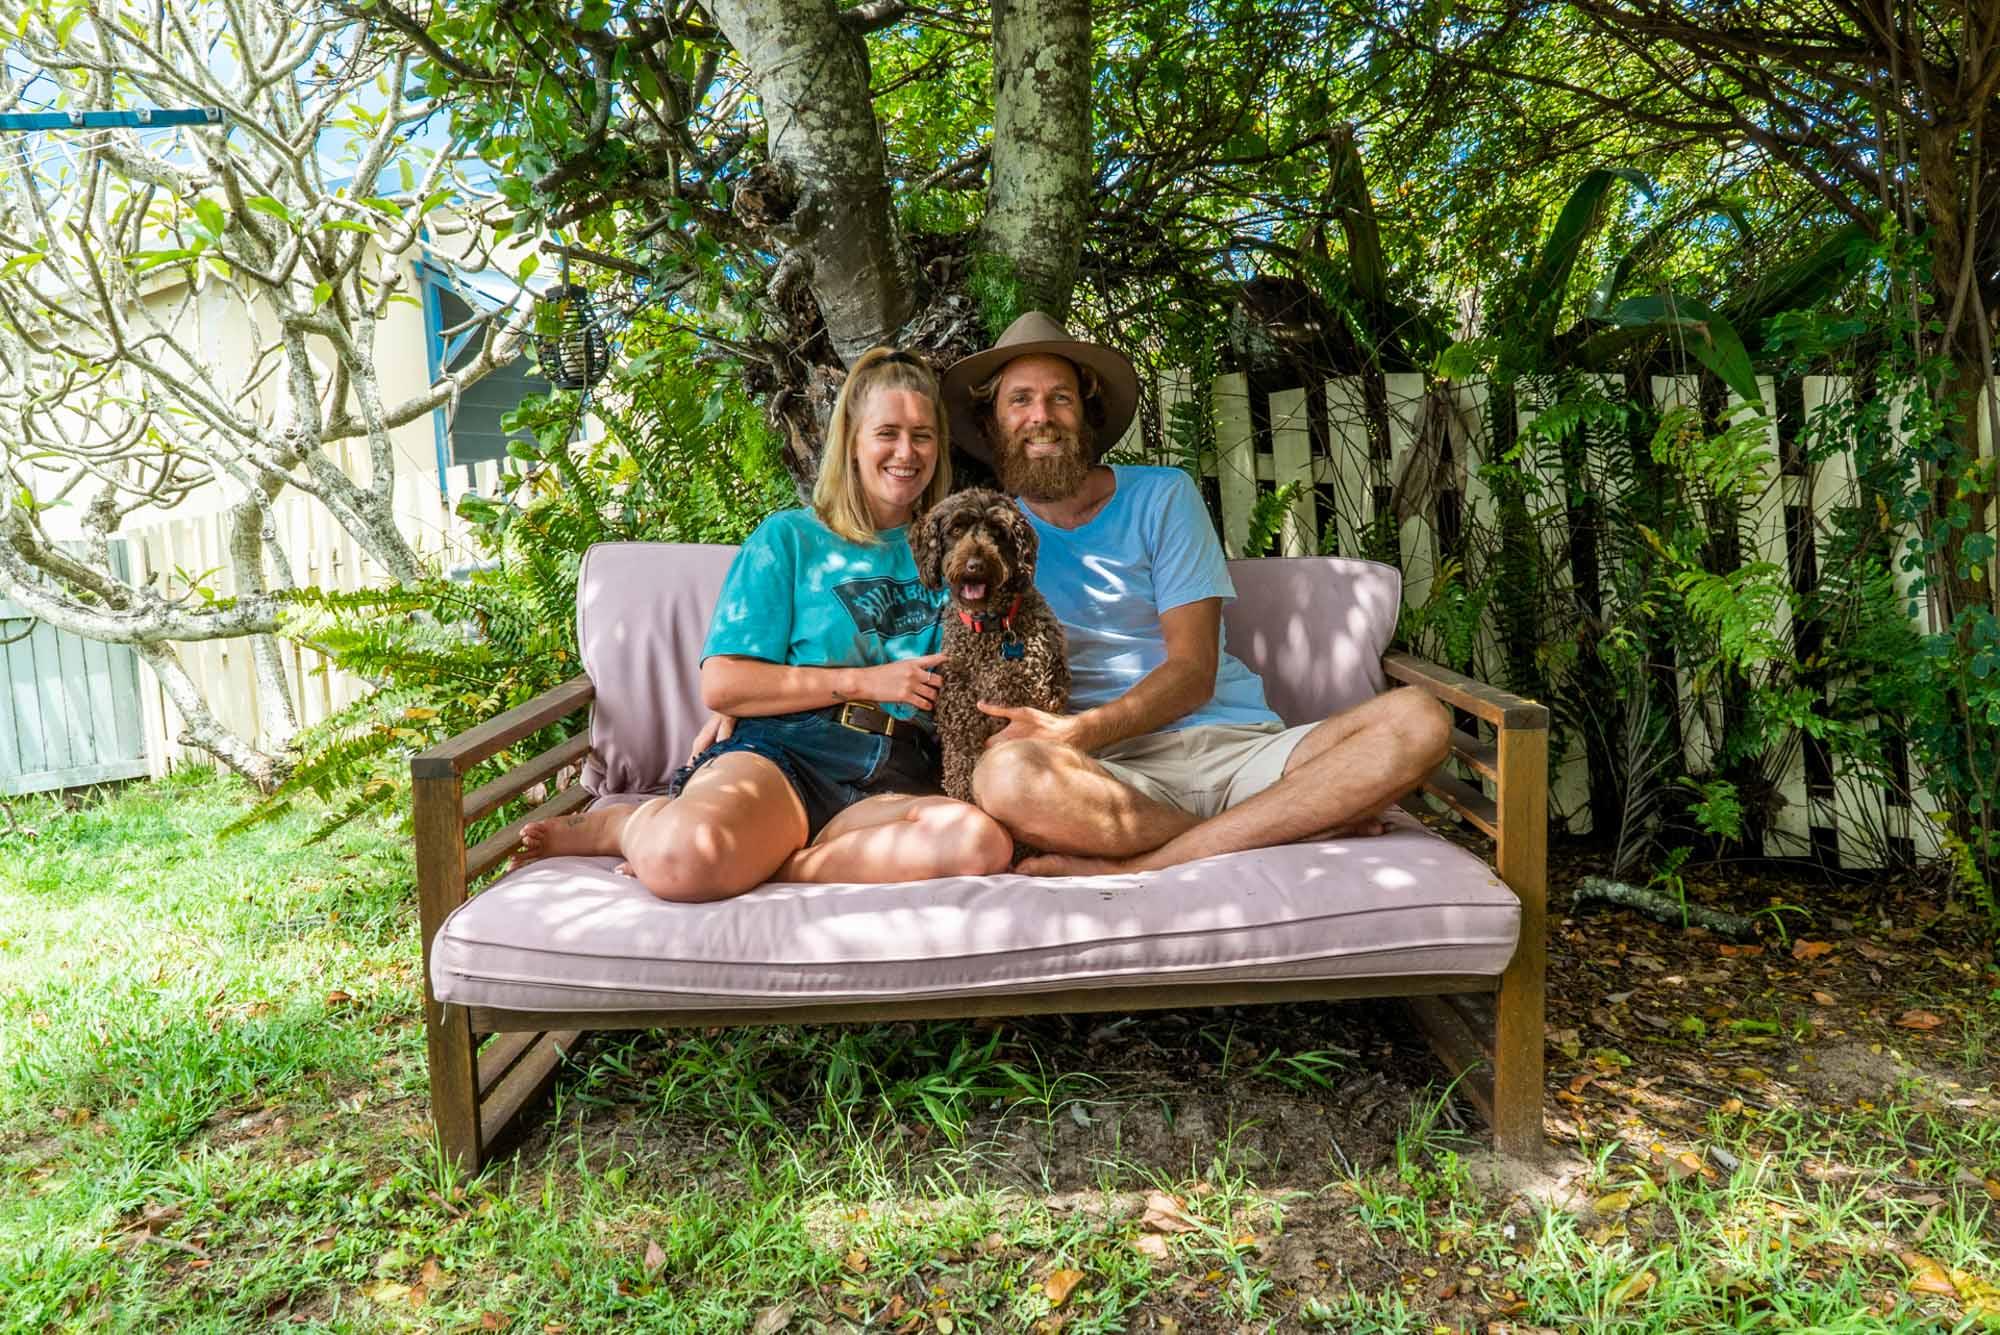 Church With No Walls - Mike and Hannah King - Mentors - Life Coaches - Meditation - Australia-11.jpg